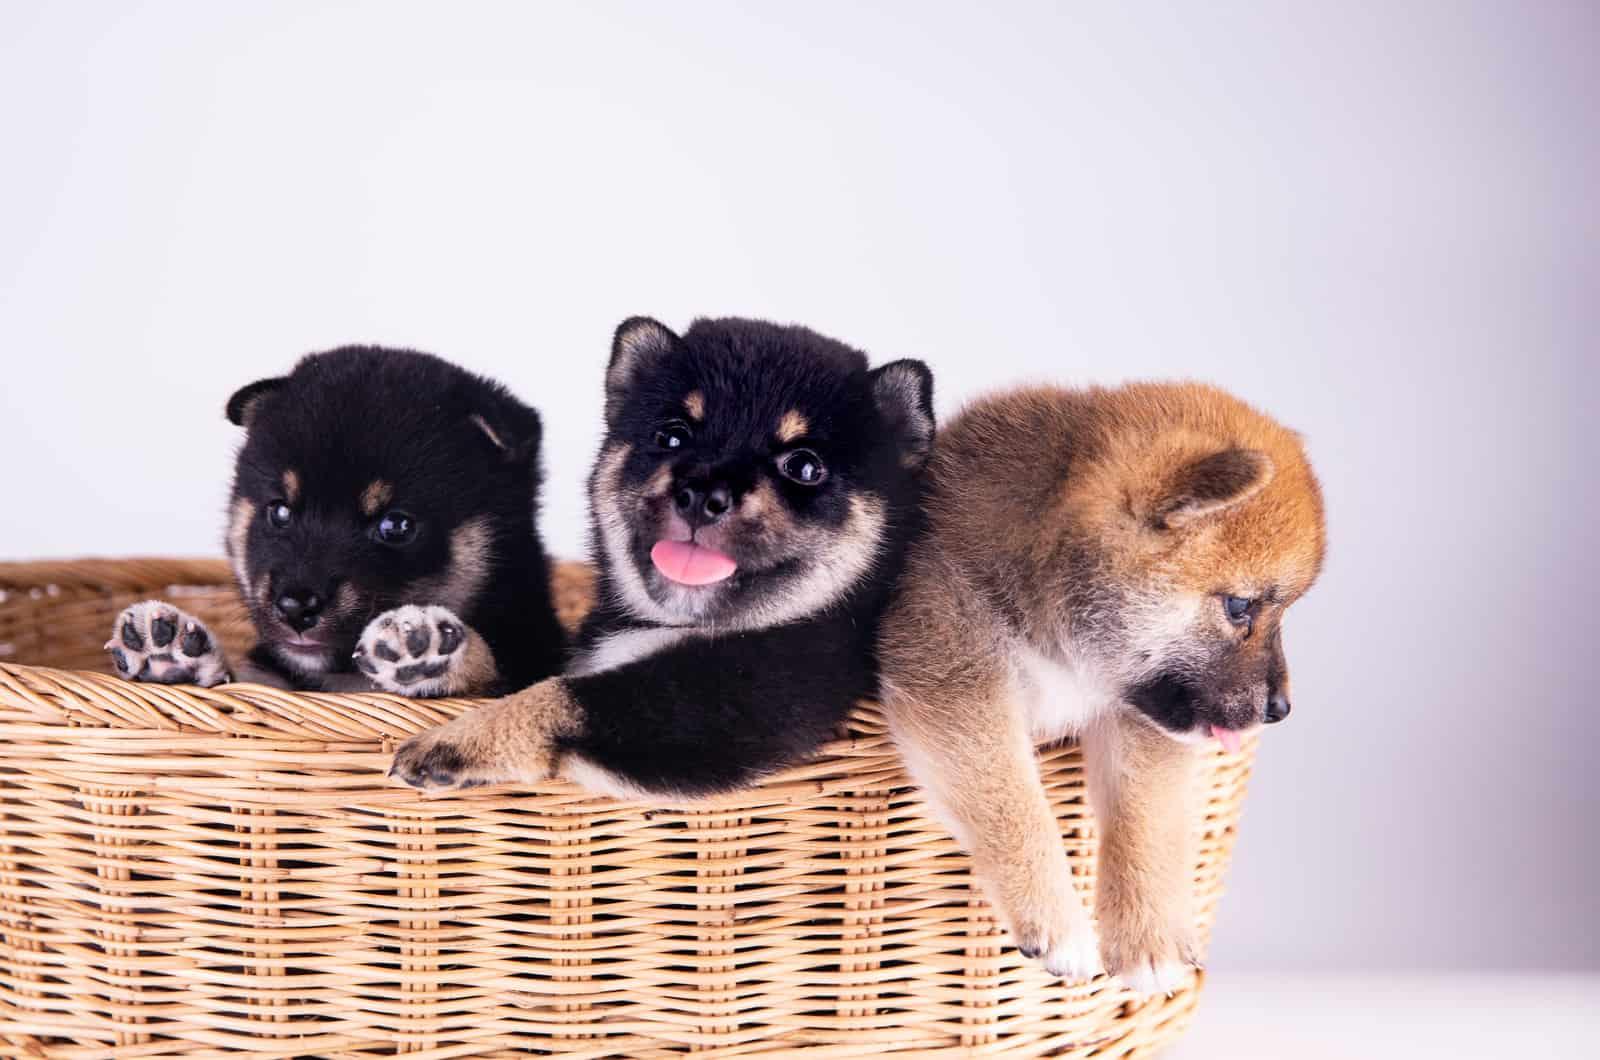 three shiba inu puppies in a basket